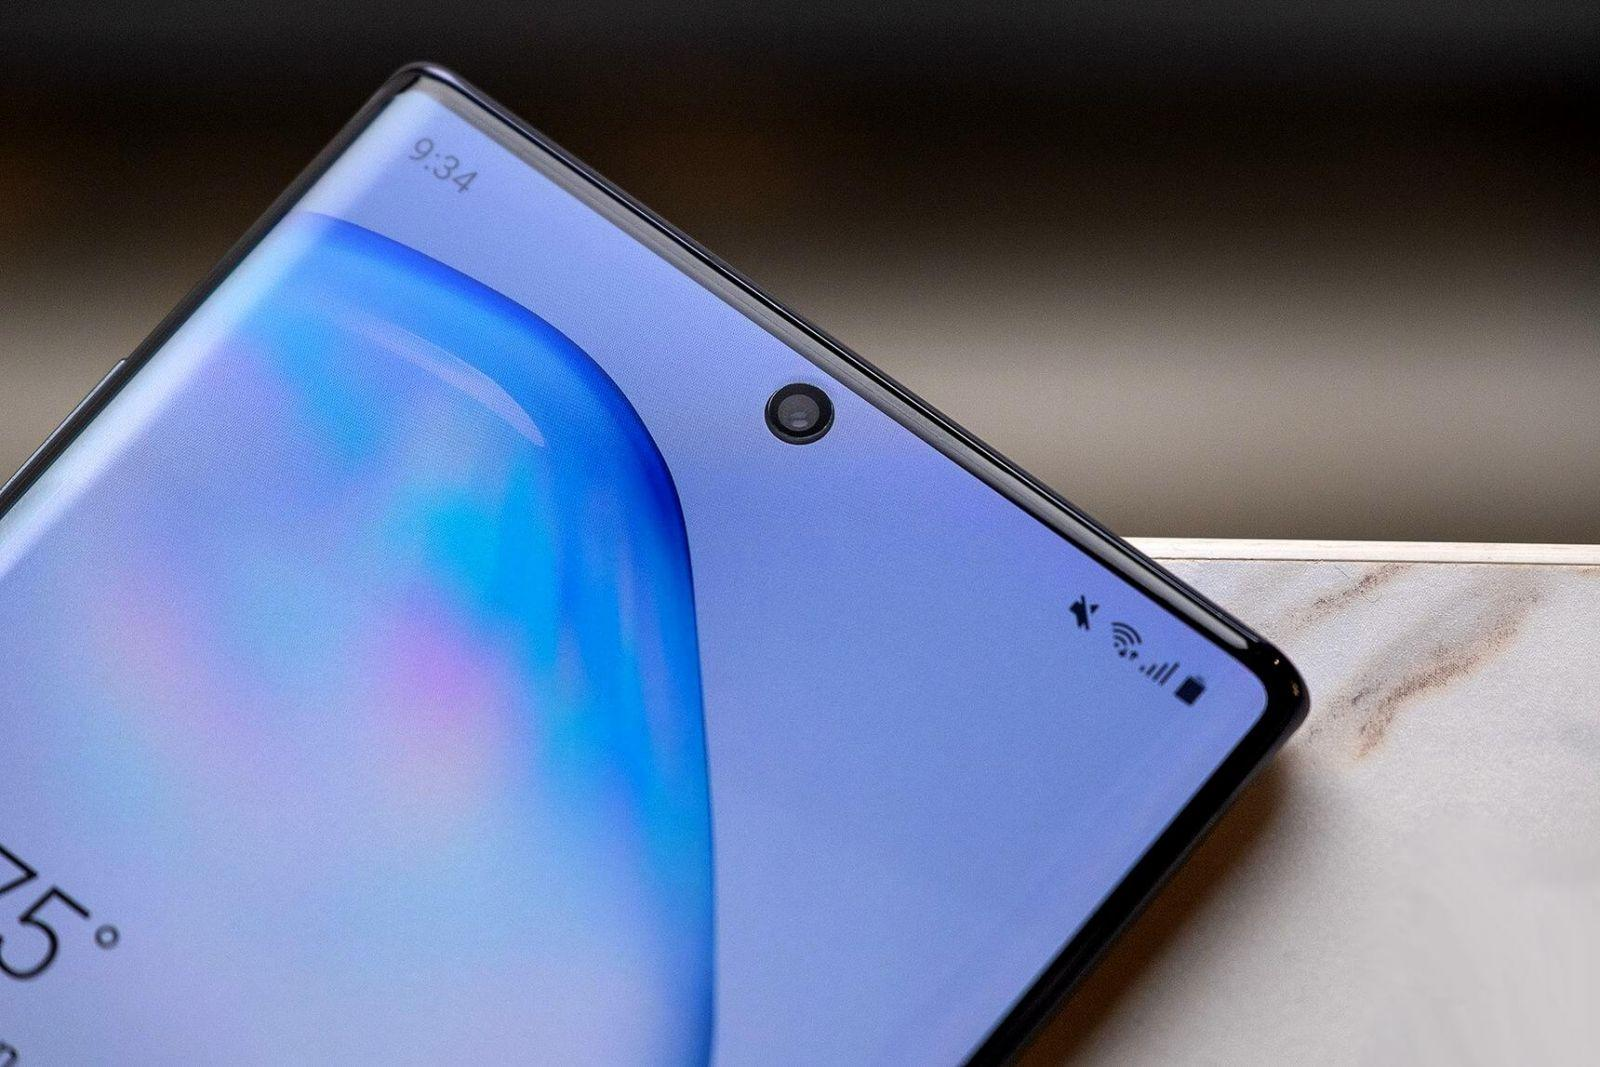 Samsung выпустит блокчейн-смартфон Galaxy Note 10 с криптокошельком (samsung galaxy note10)